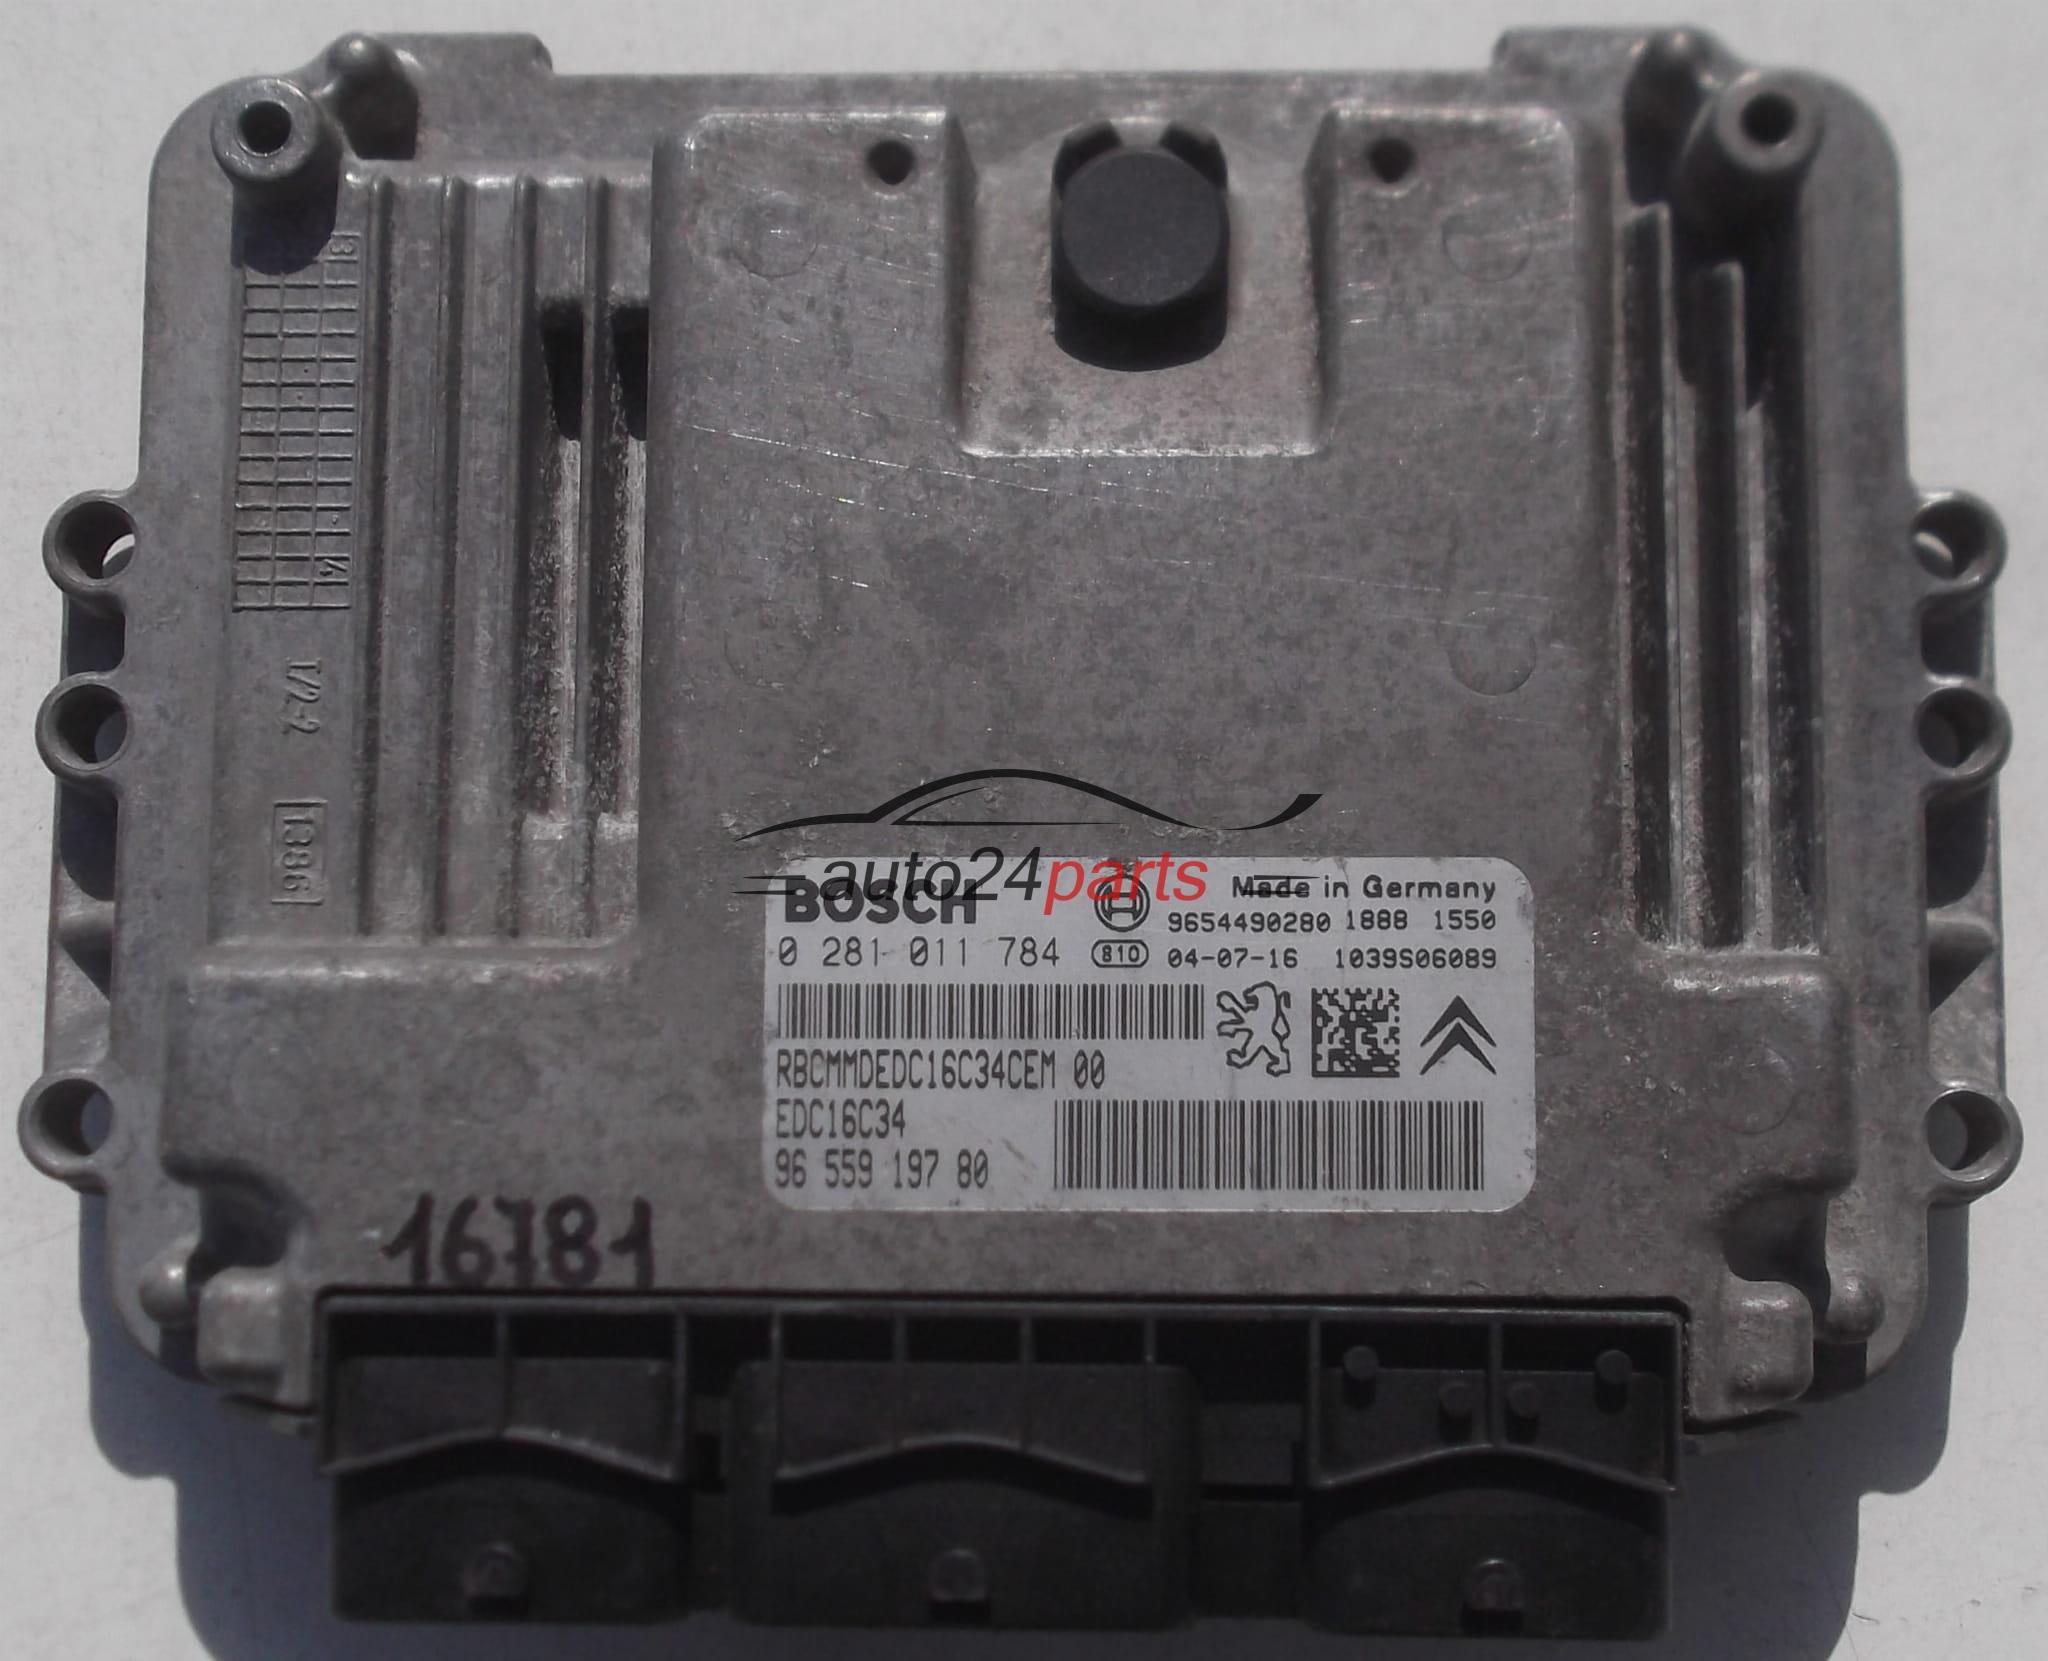 Peugeot 206 Radio Lockedpeugeot Code Decode Unlock Codelocked Fuse Box Ebay Ecu Engine Controller 1 4 Bosch 0 281 011 784